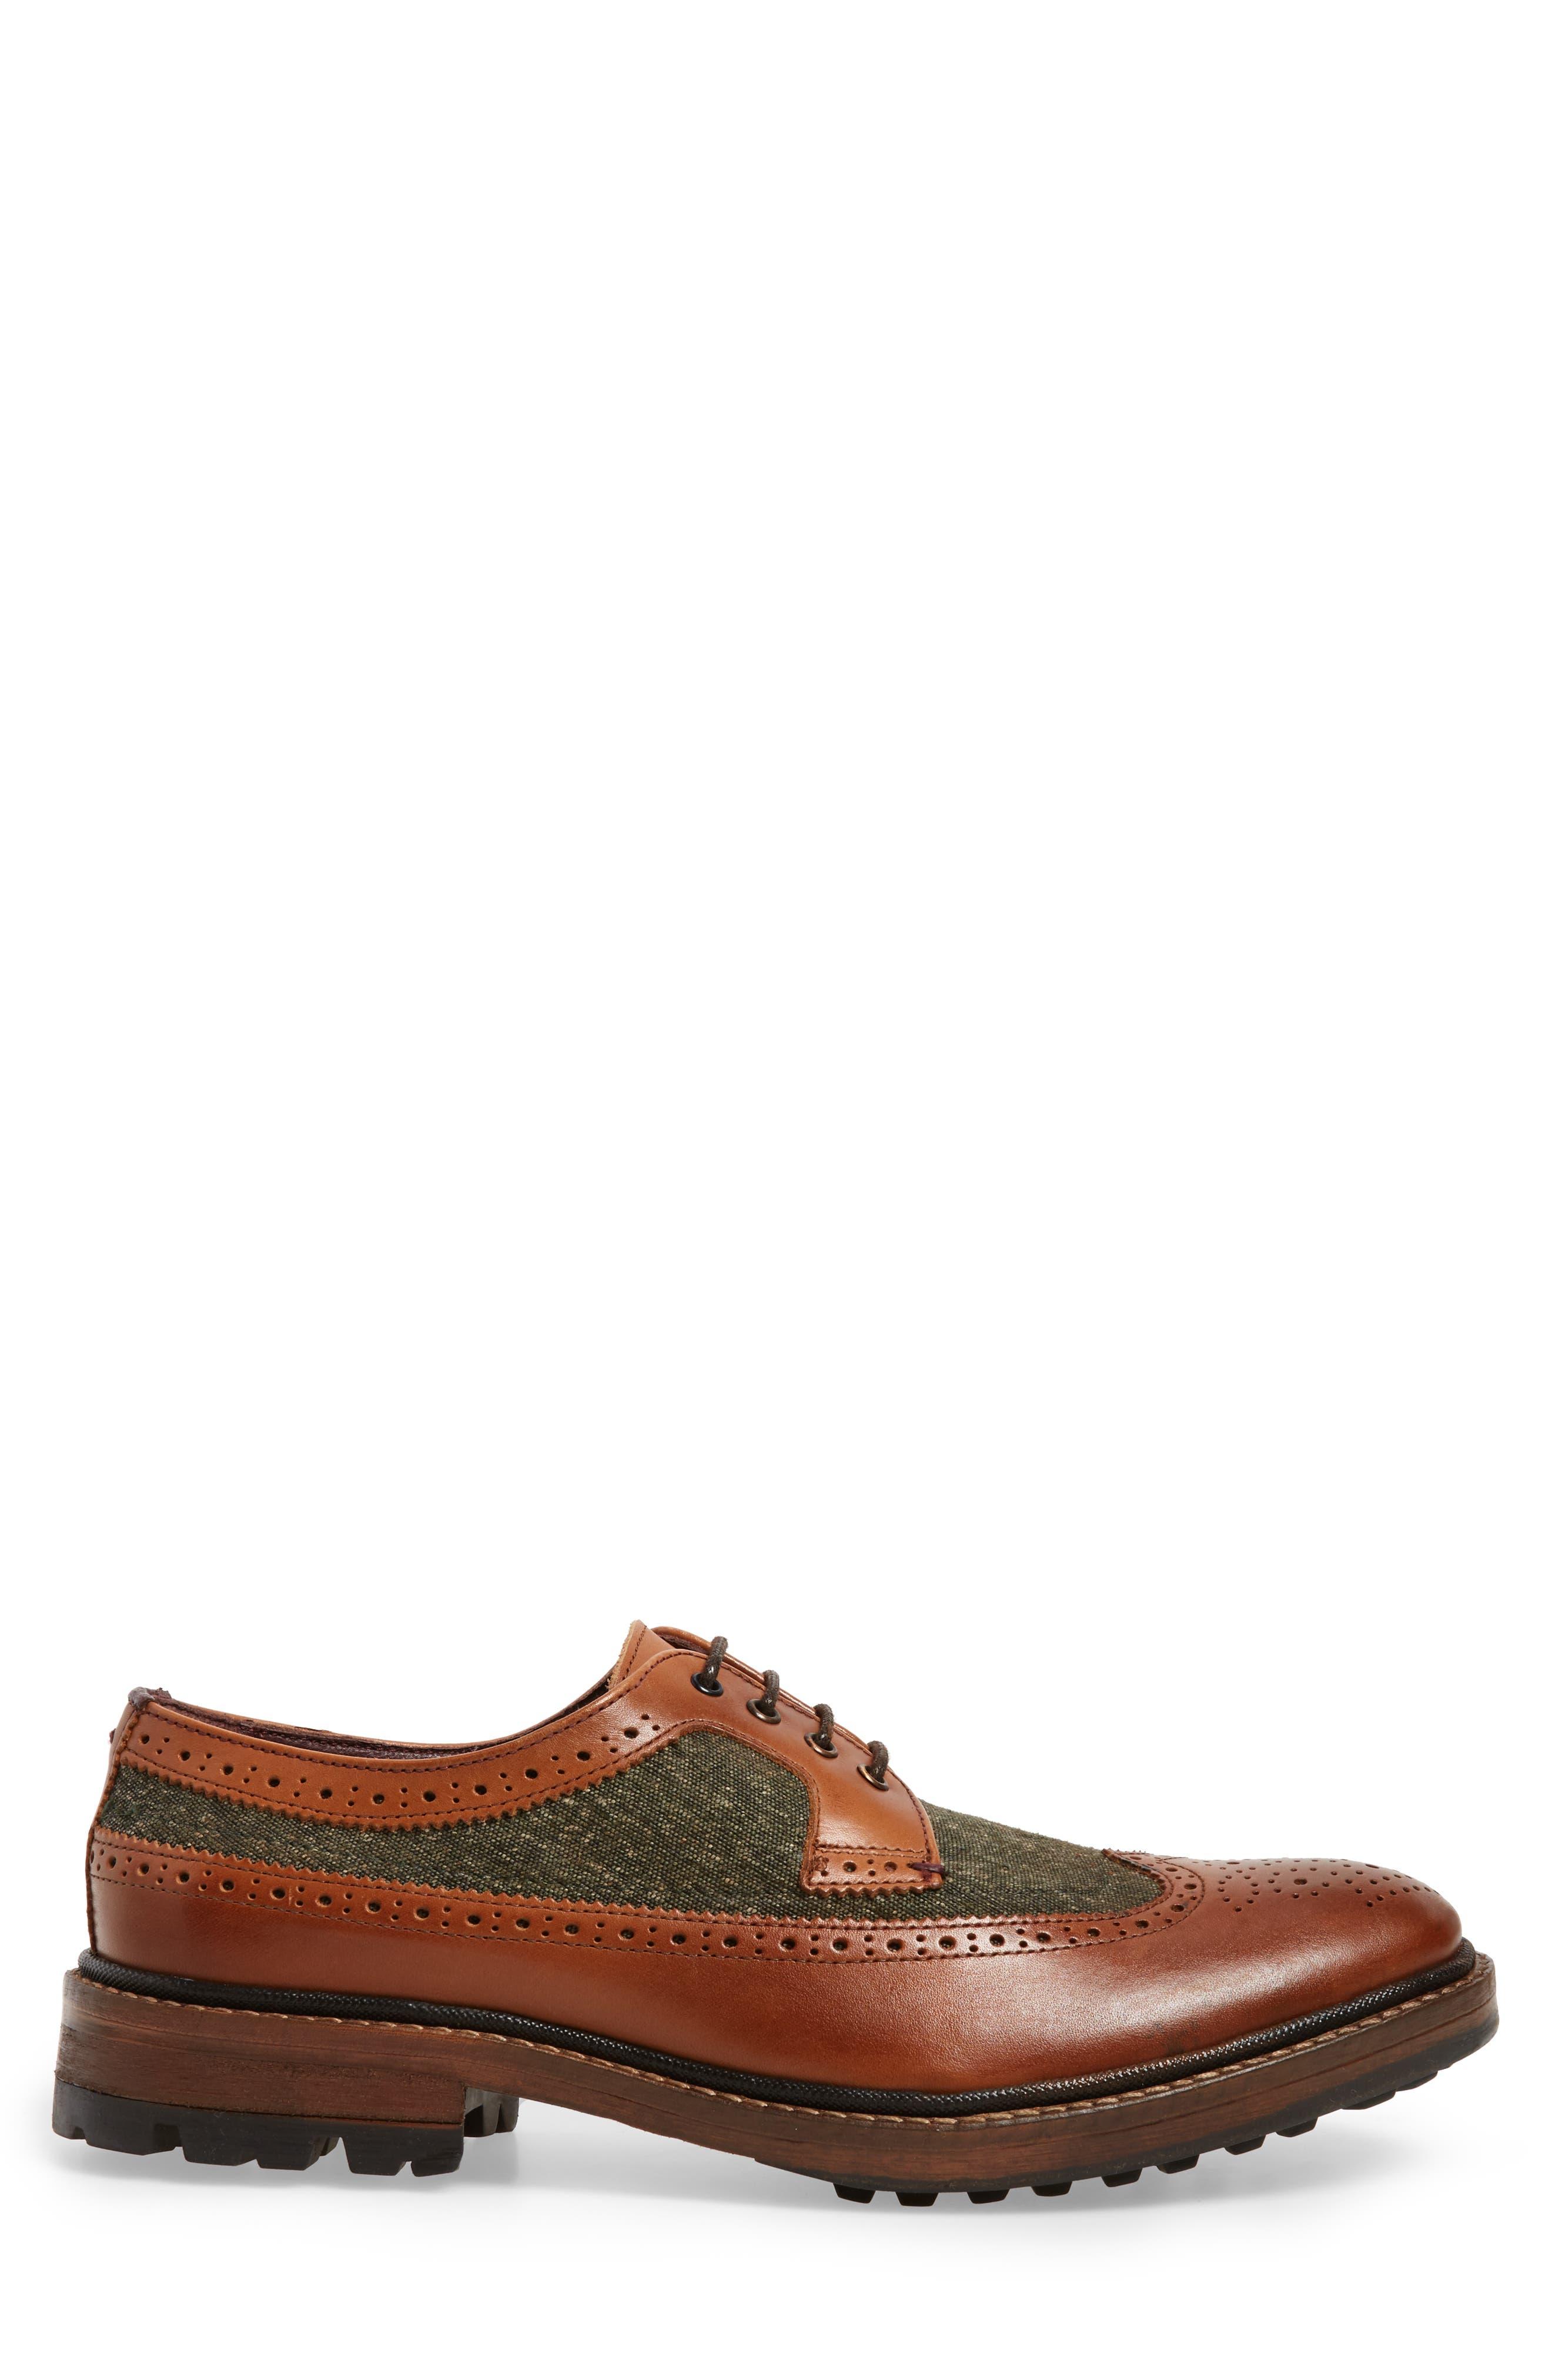 Casbo Spectator Shoe,                             Alternate thumbnail 6, color,